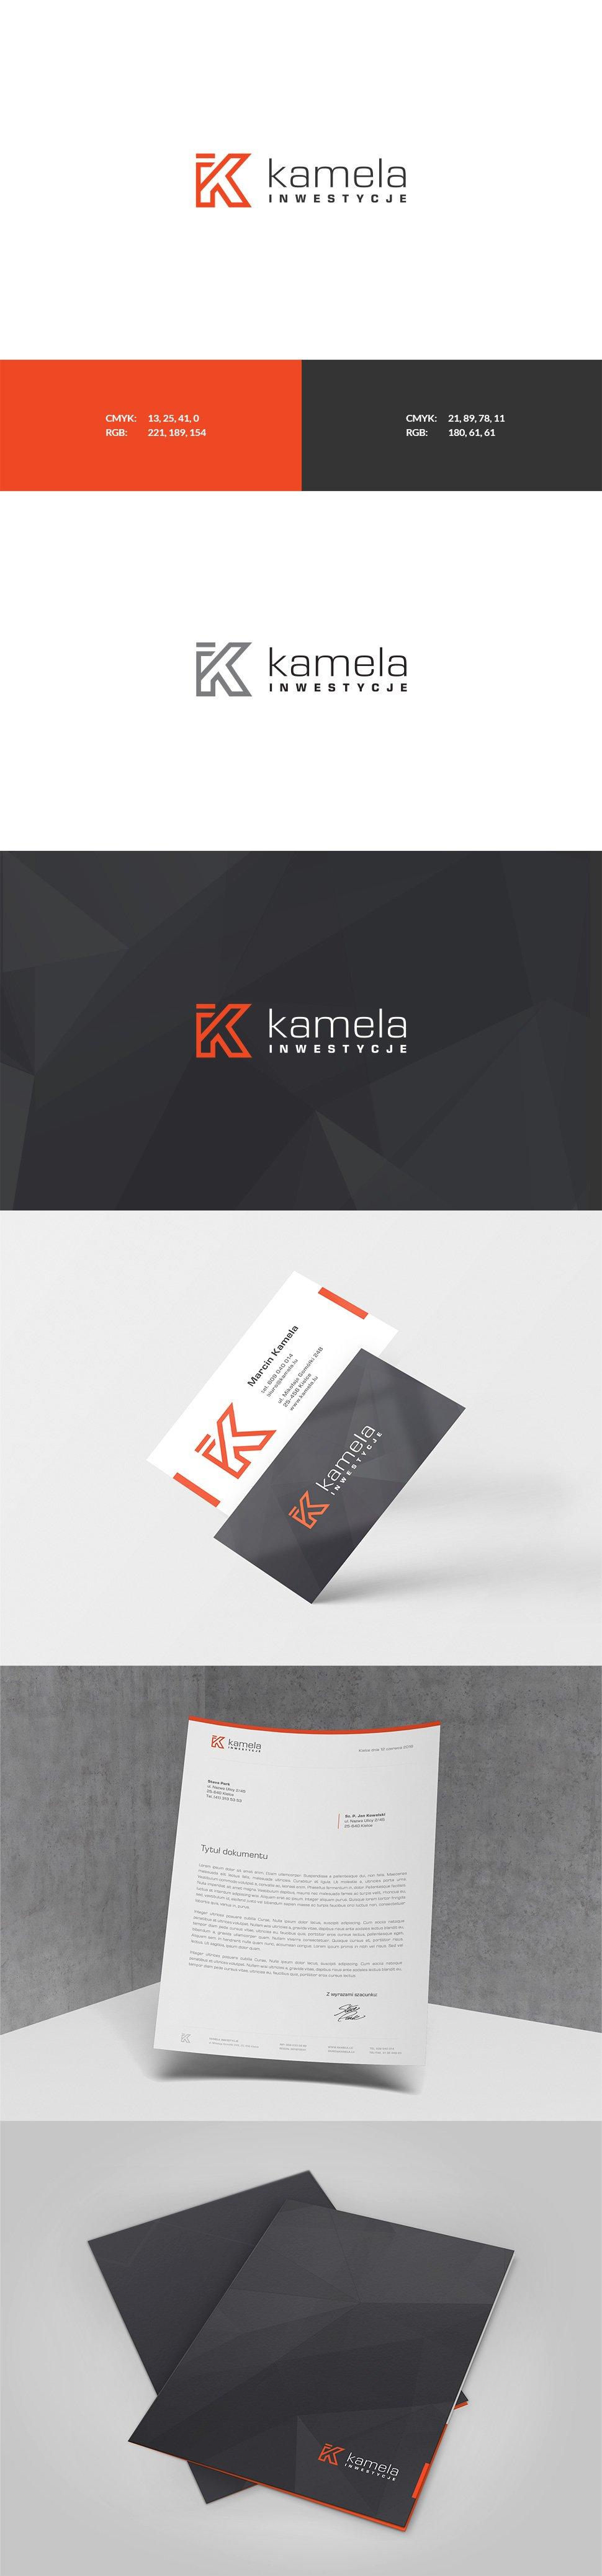 Identyfikacja Kamela